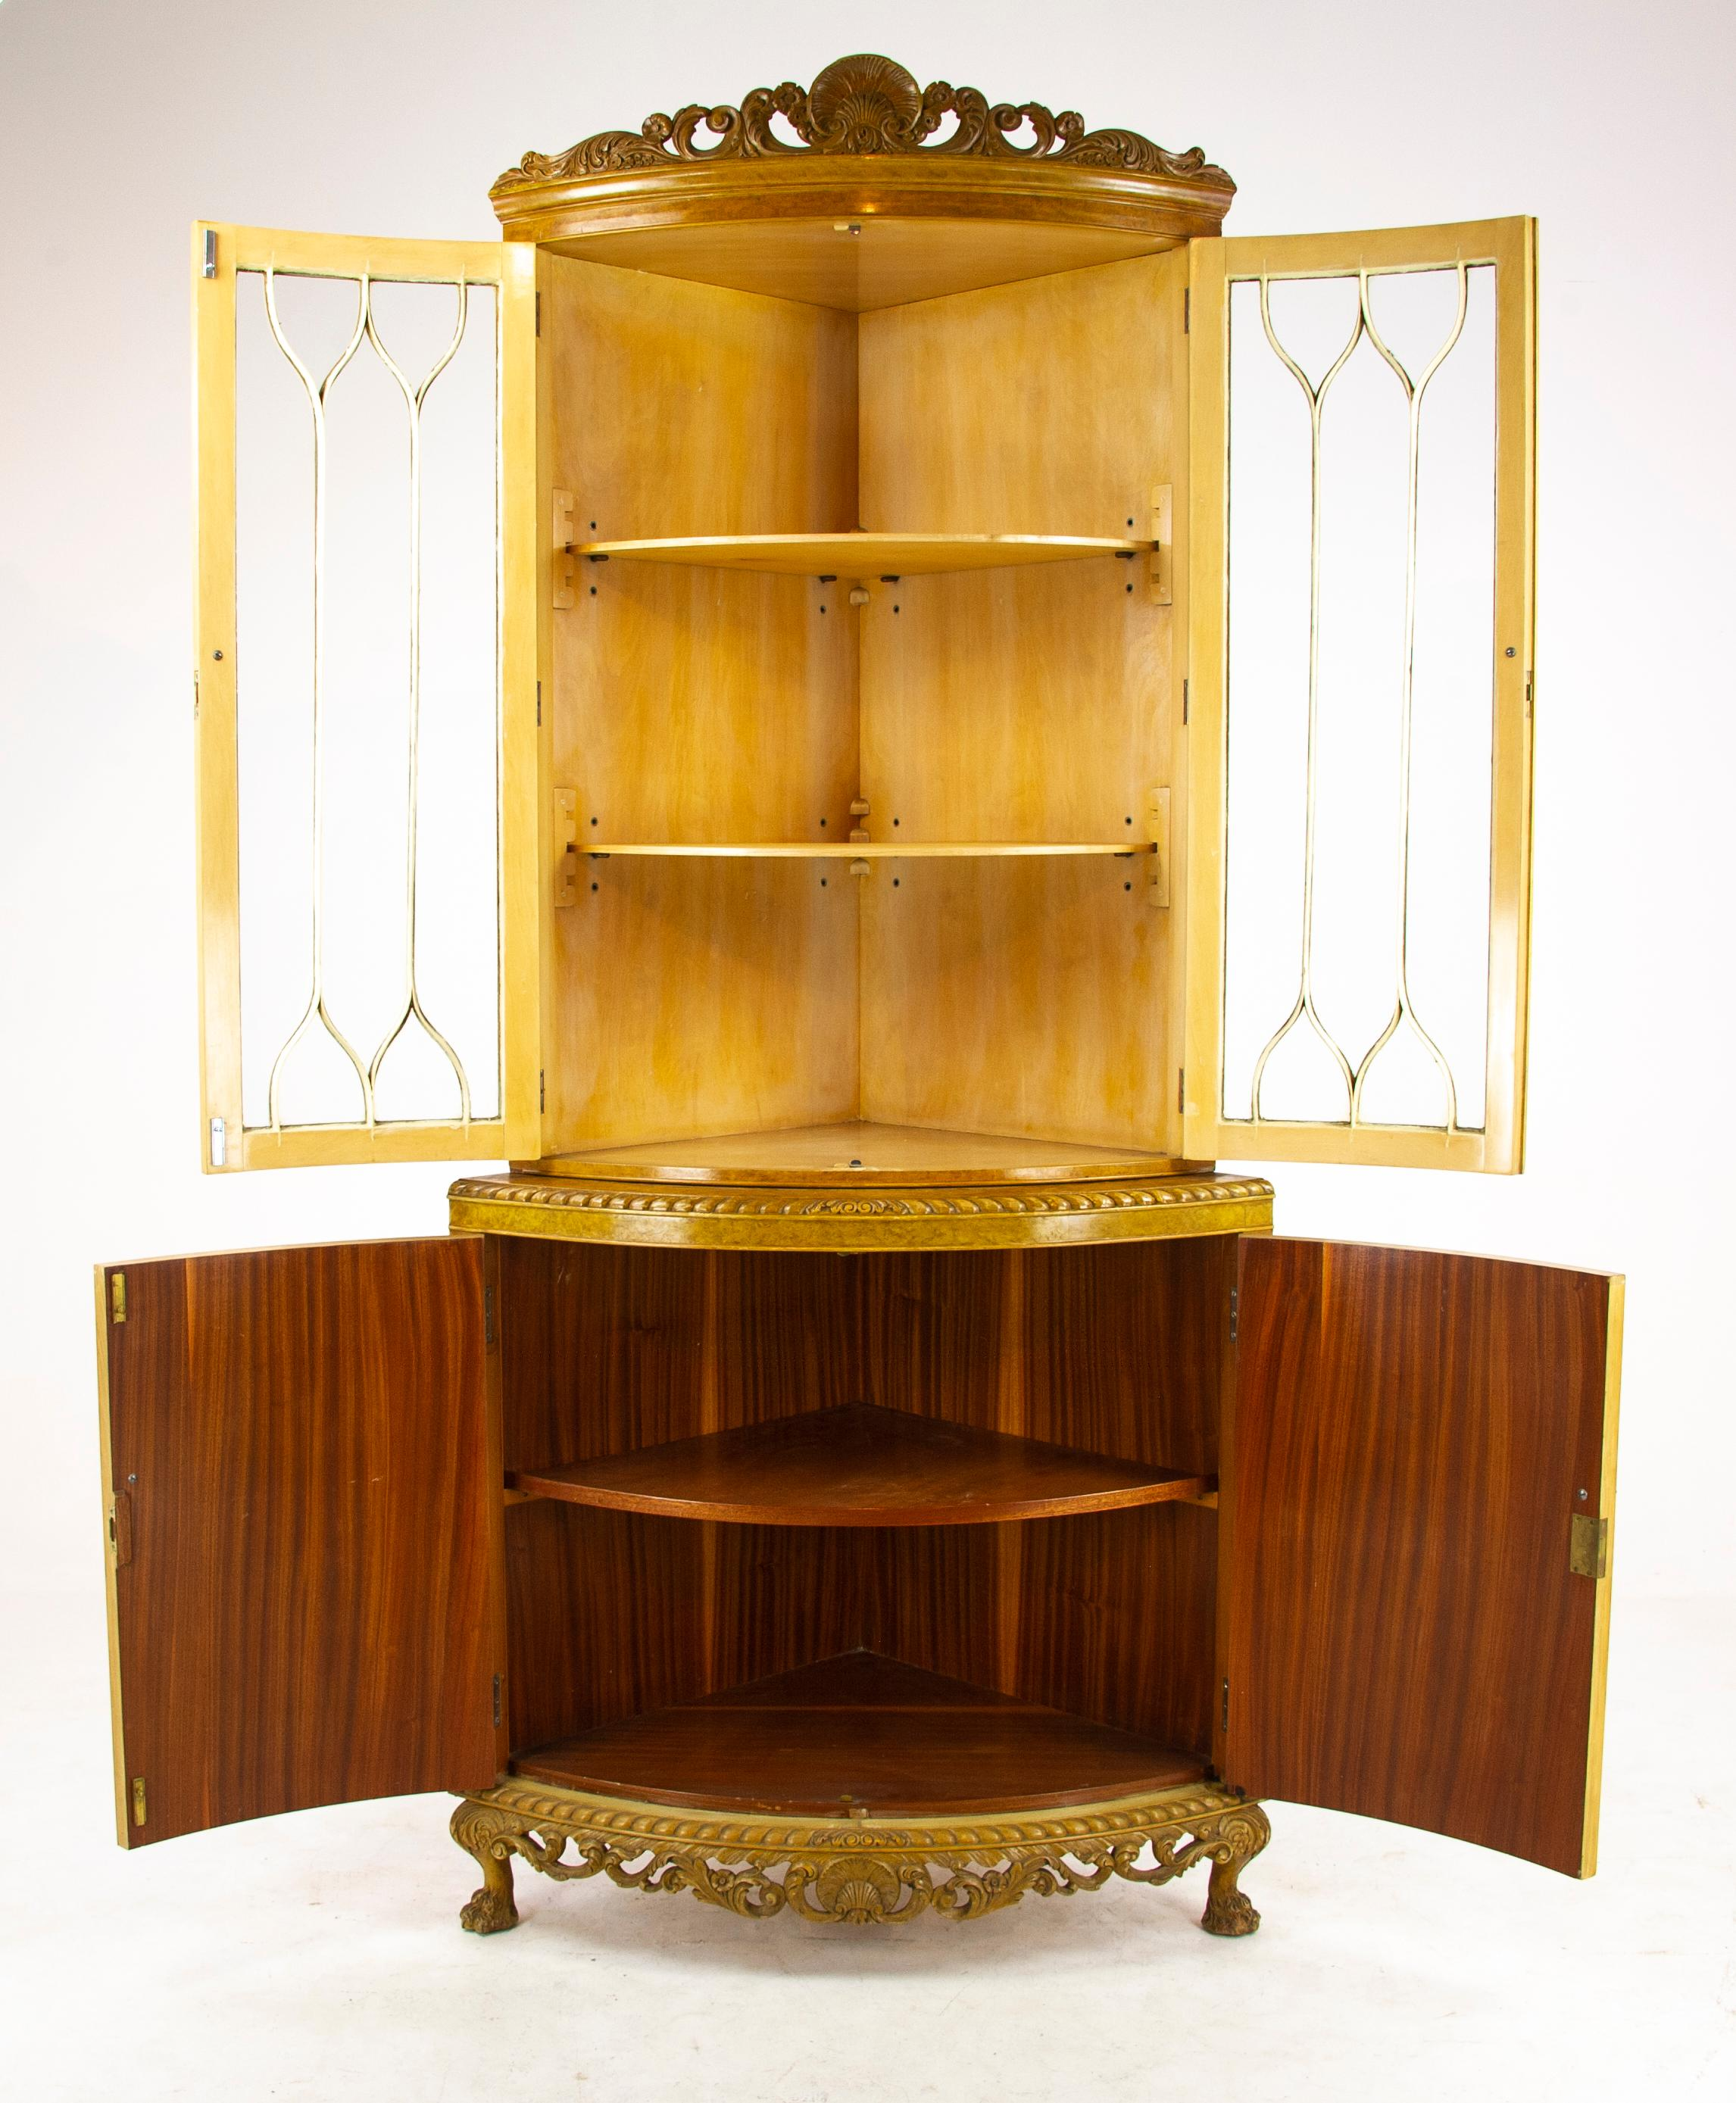 Antique China Cabinet, Walnut, Bow Front, Curio Cabinet, Scotland, 1930,  B1176